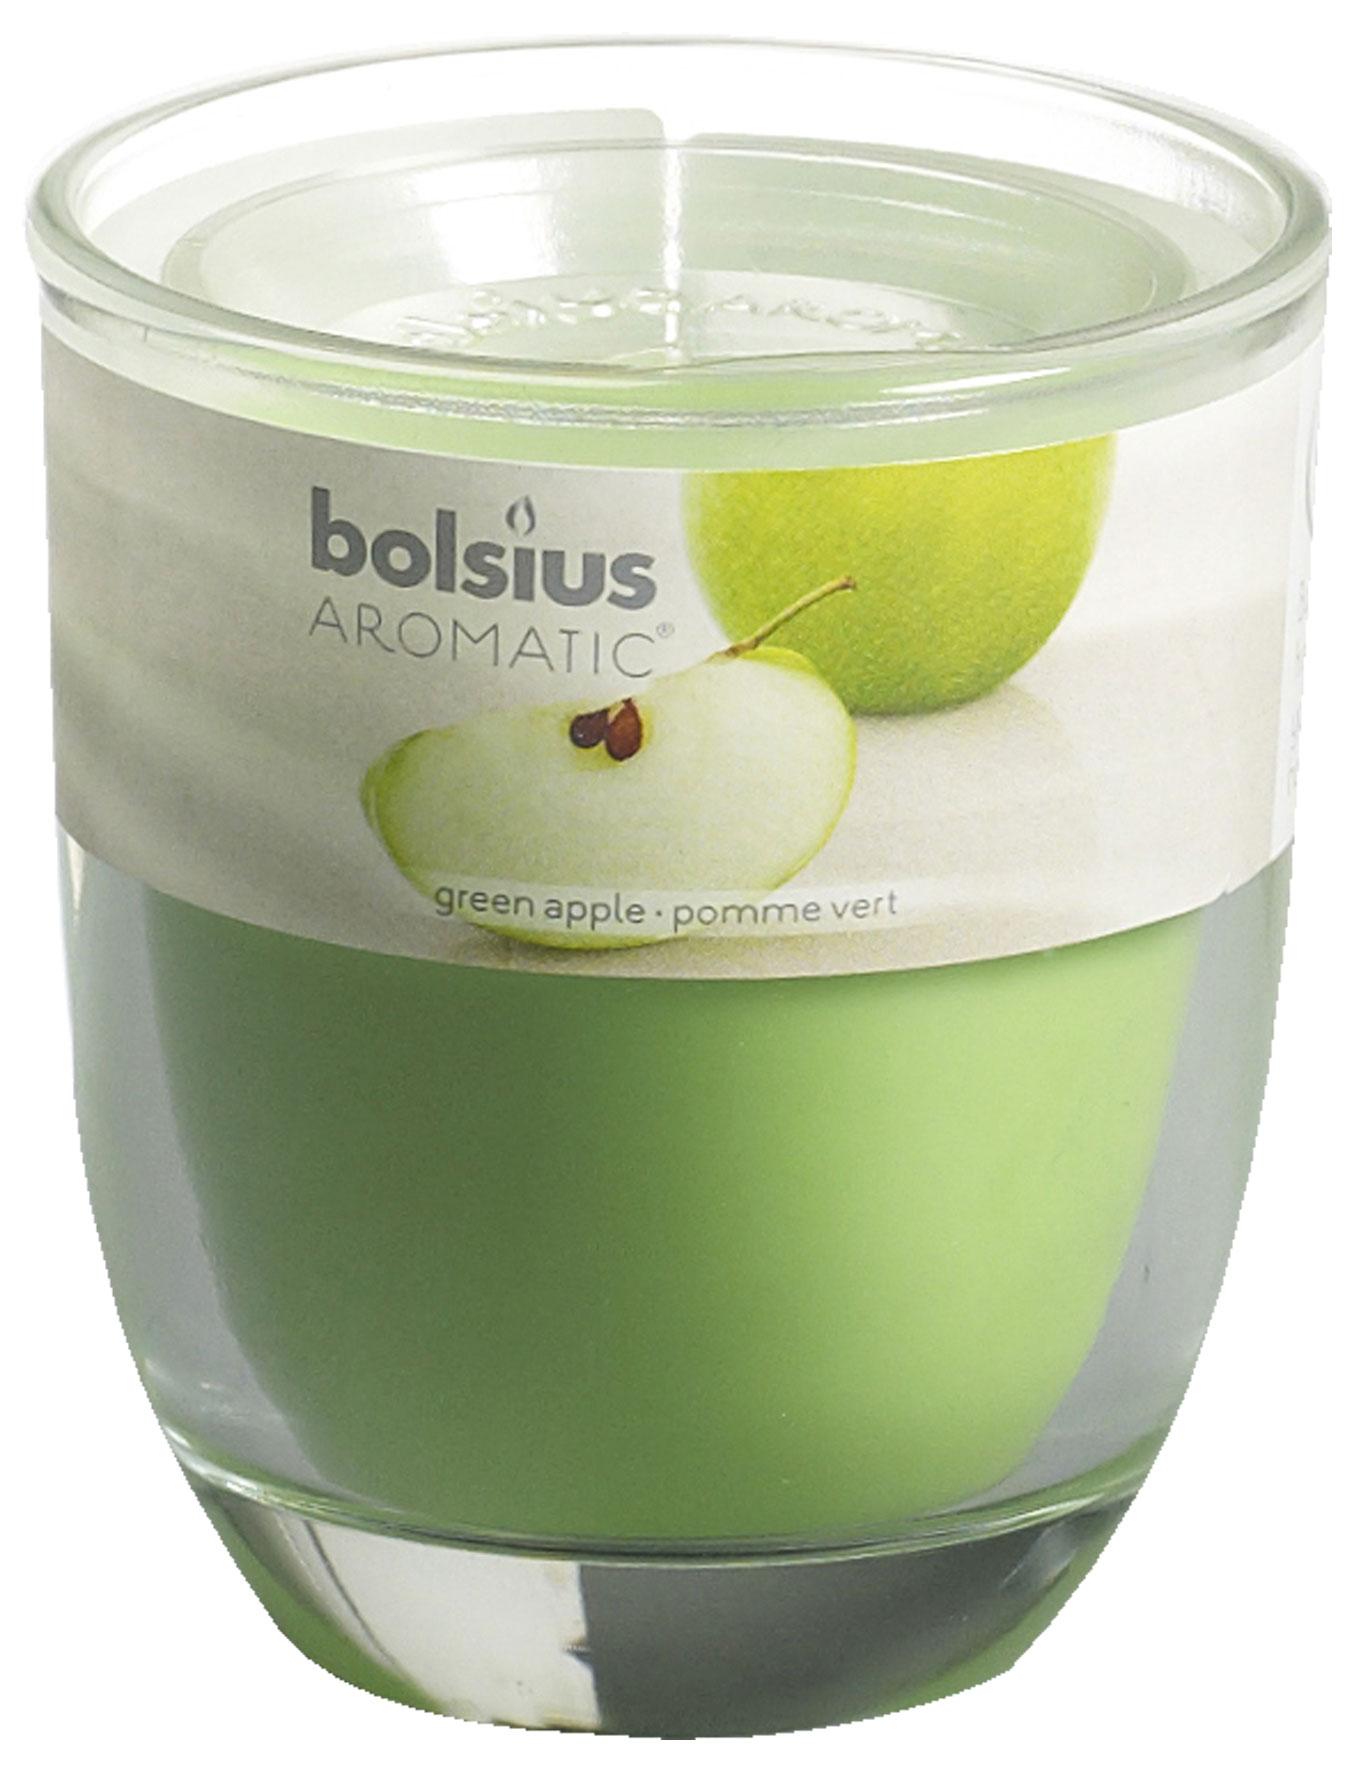 Bolsius Duftkerze Aromatic im Glas Grüner Apfel Bild 1